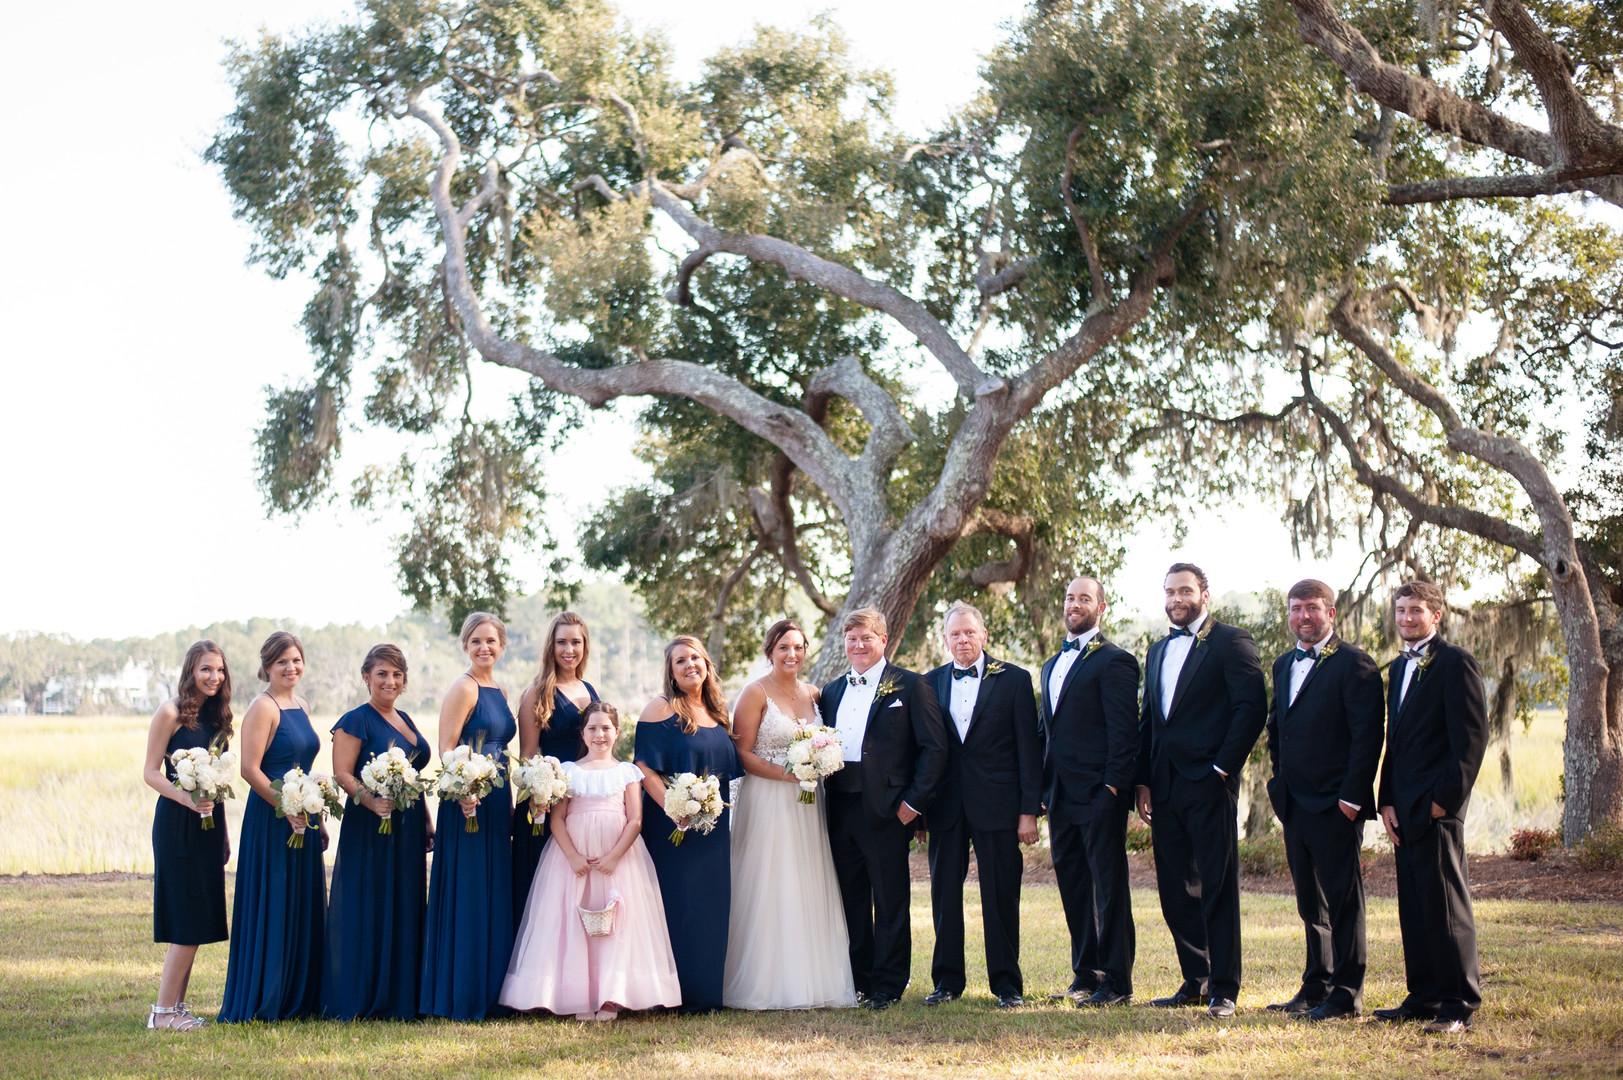 cypress-trees-plantation-wedding-14.jpg